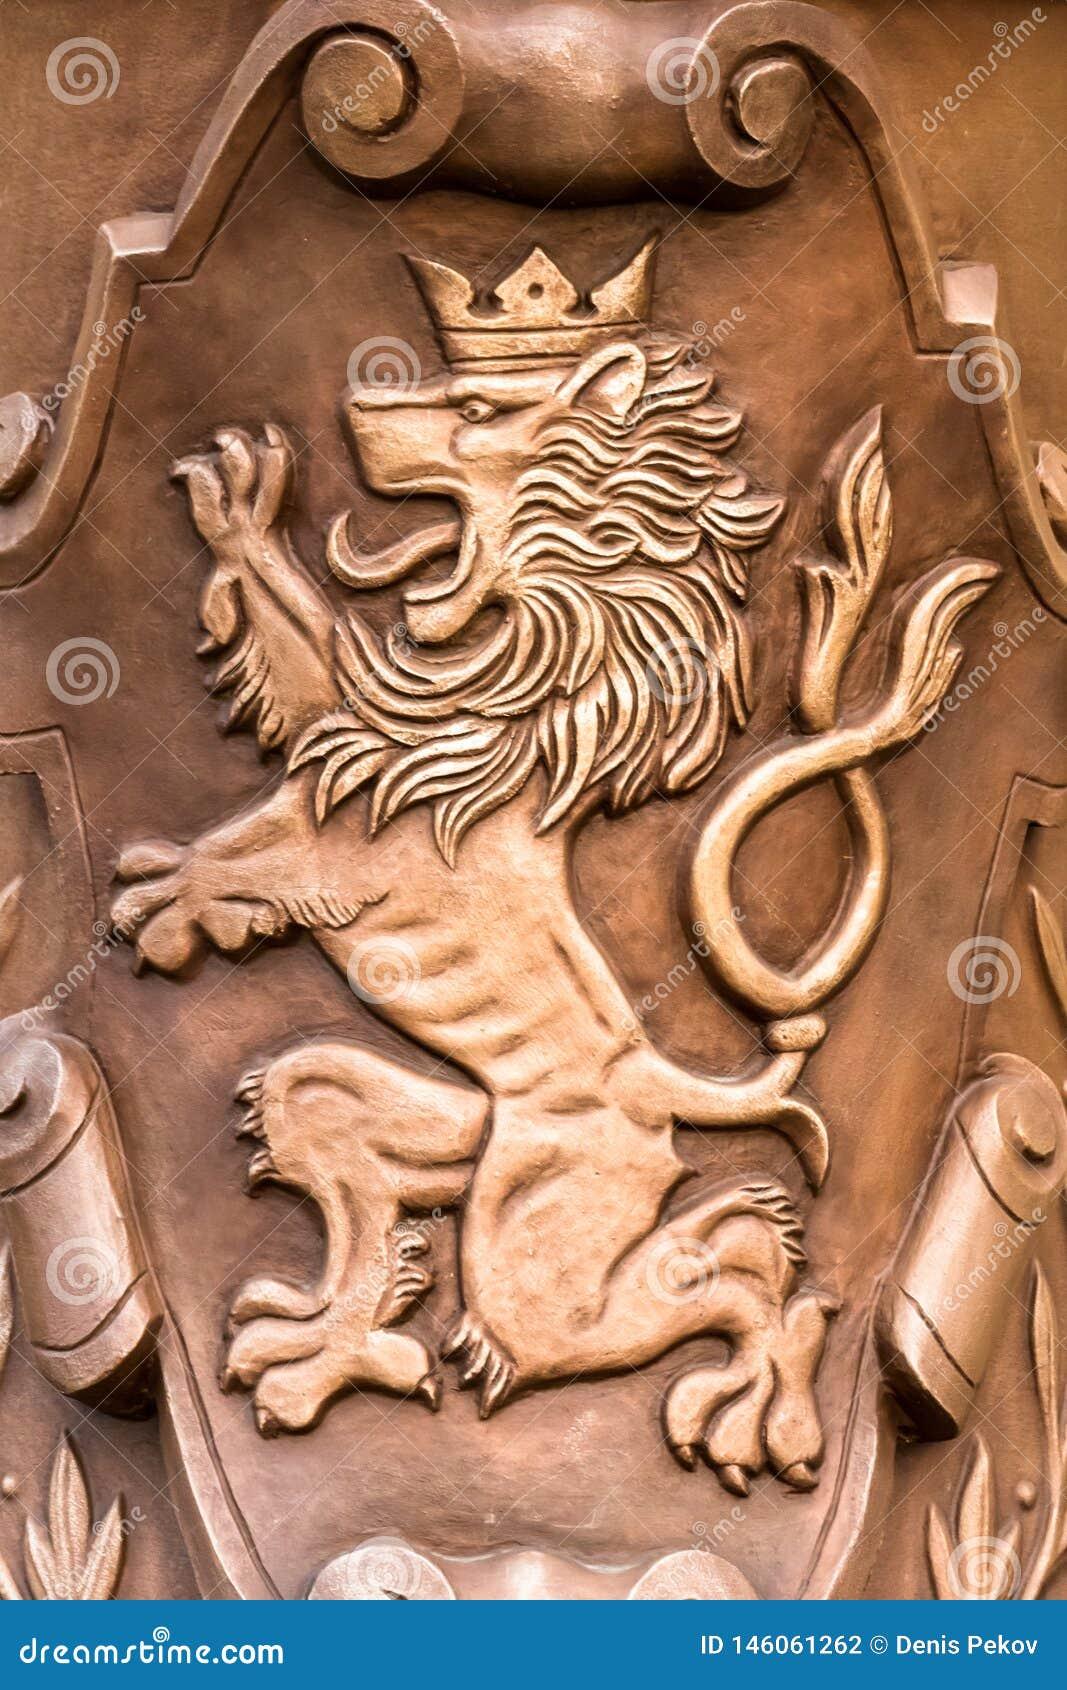 Prague/Tjeckien 03 31 2019: vapenskölden brons lejonet framlänges